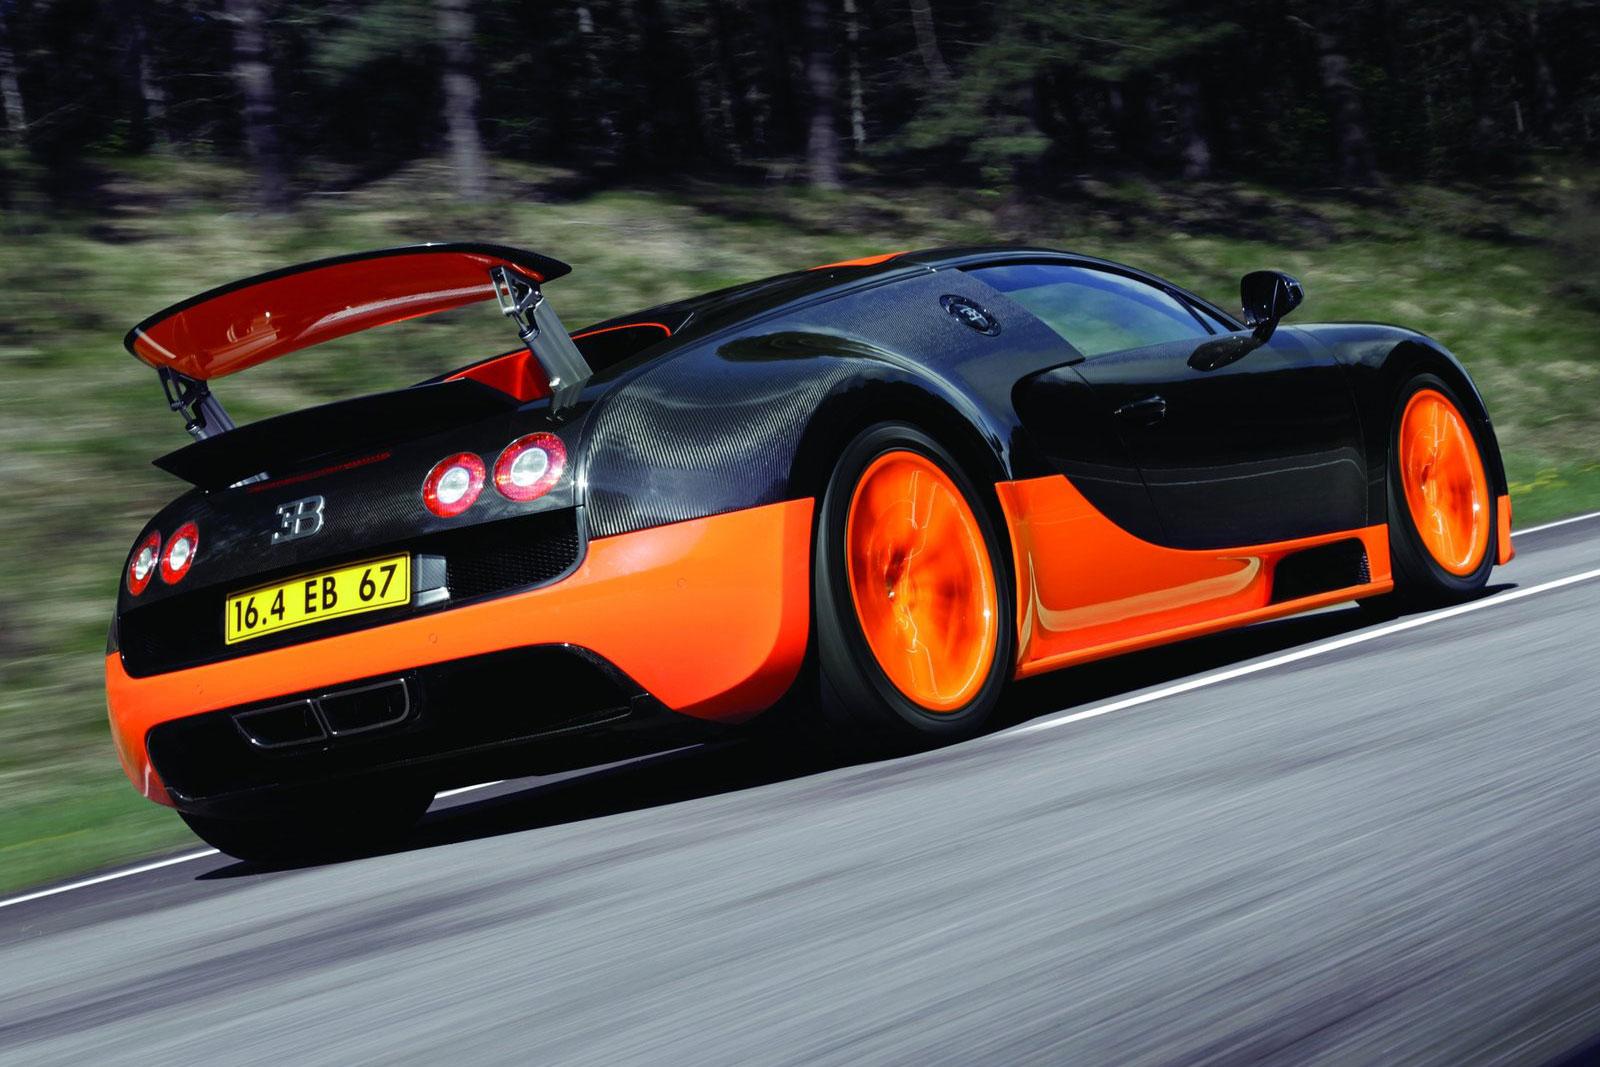 Luxury Vehicle: Bugatti Working On New Veyron With 1,600HP